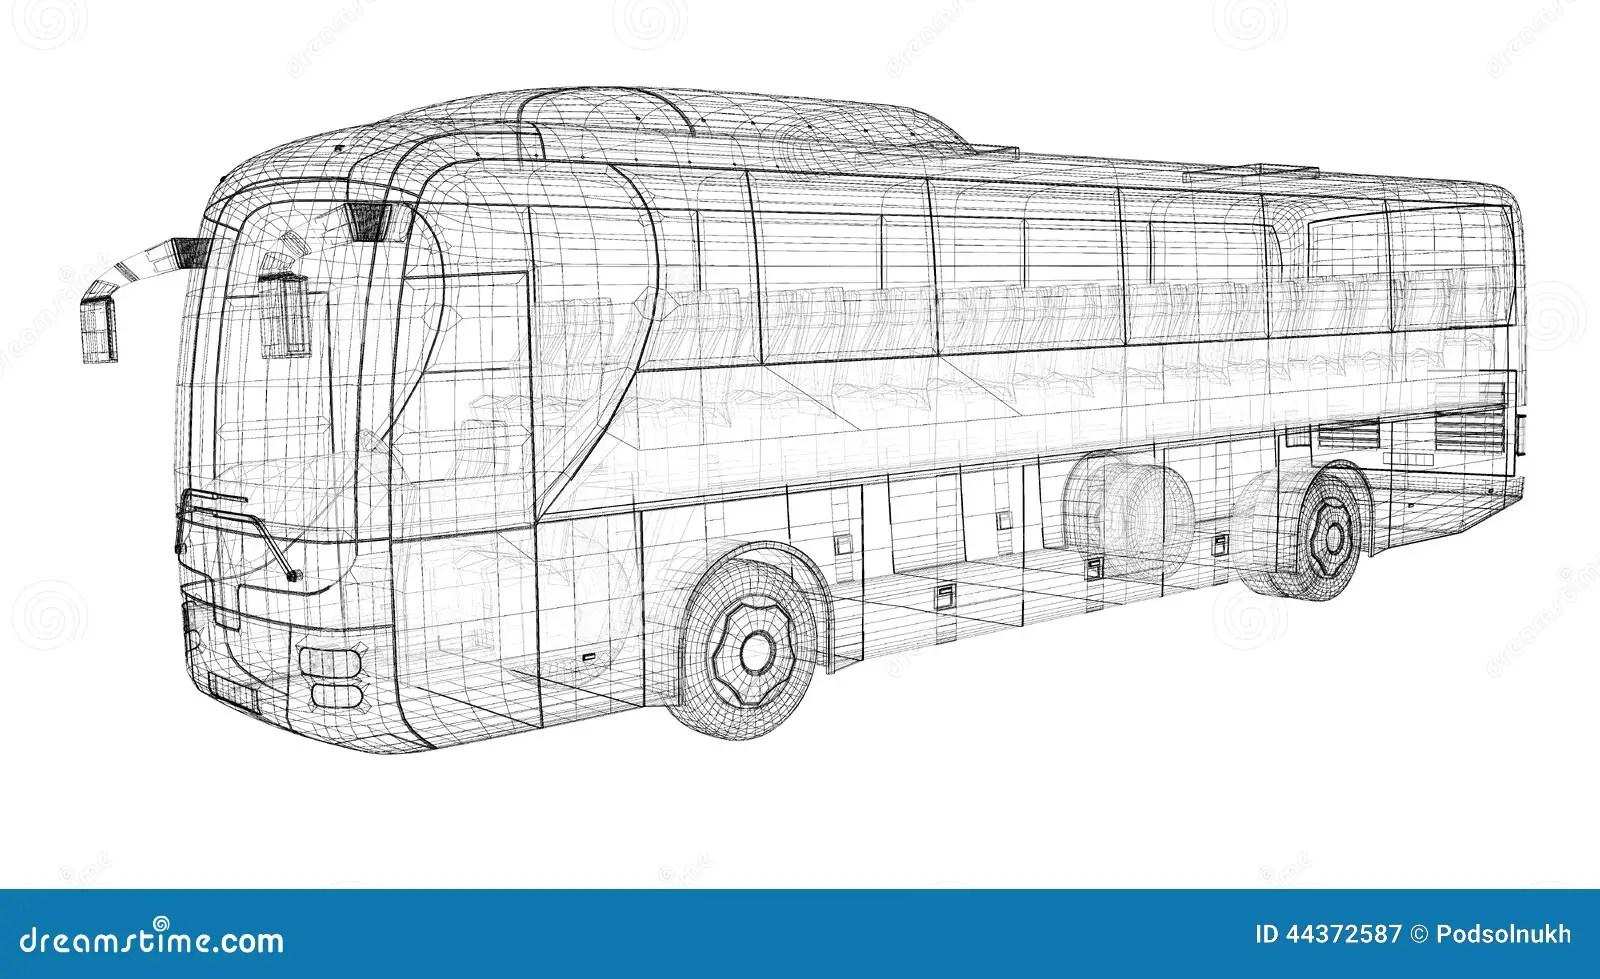 Autobus stock image. Image of mode, sales, backgrounds